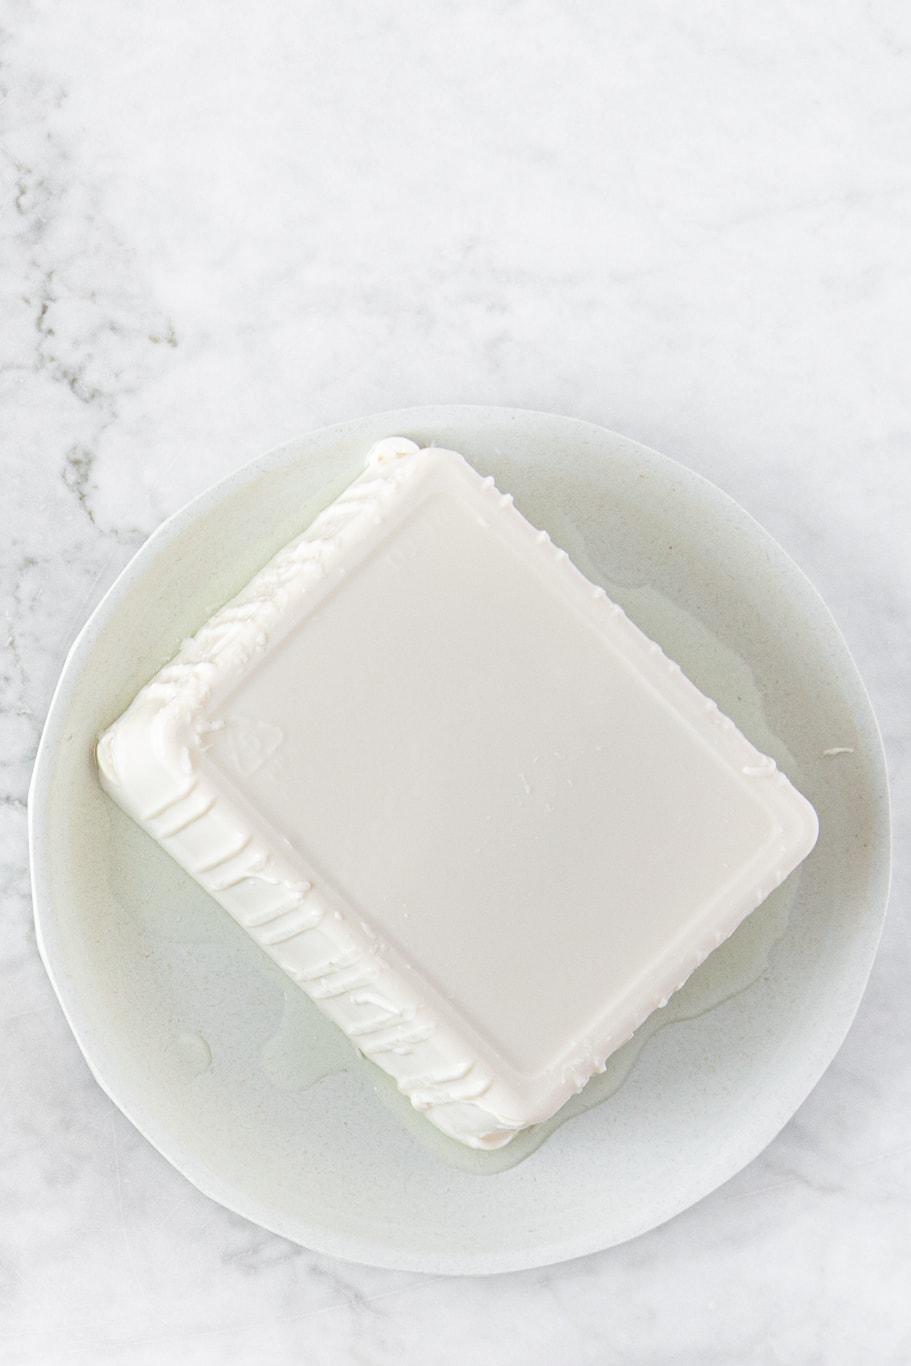 plate of a block of silken tofu